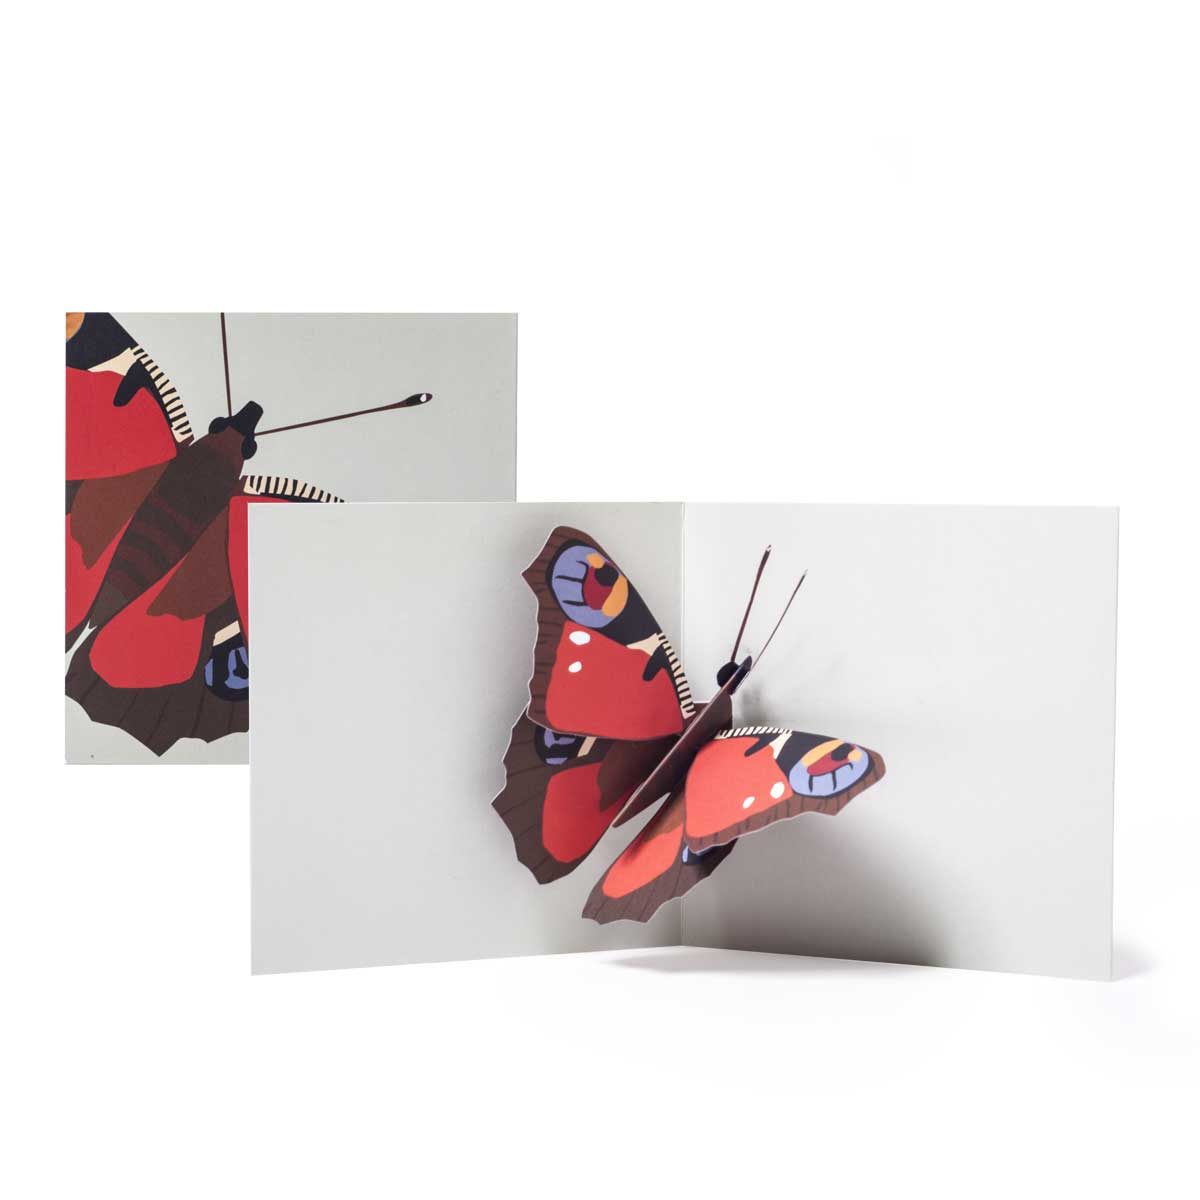 2-to-Tango_Red-Butterfly-Pop-up-card_MaikeBiederstaedt.jpg.jpg